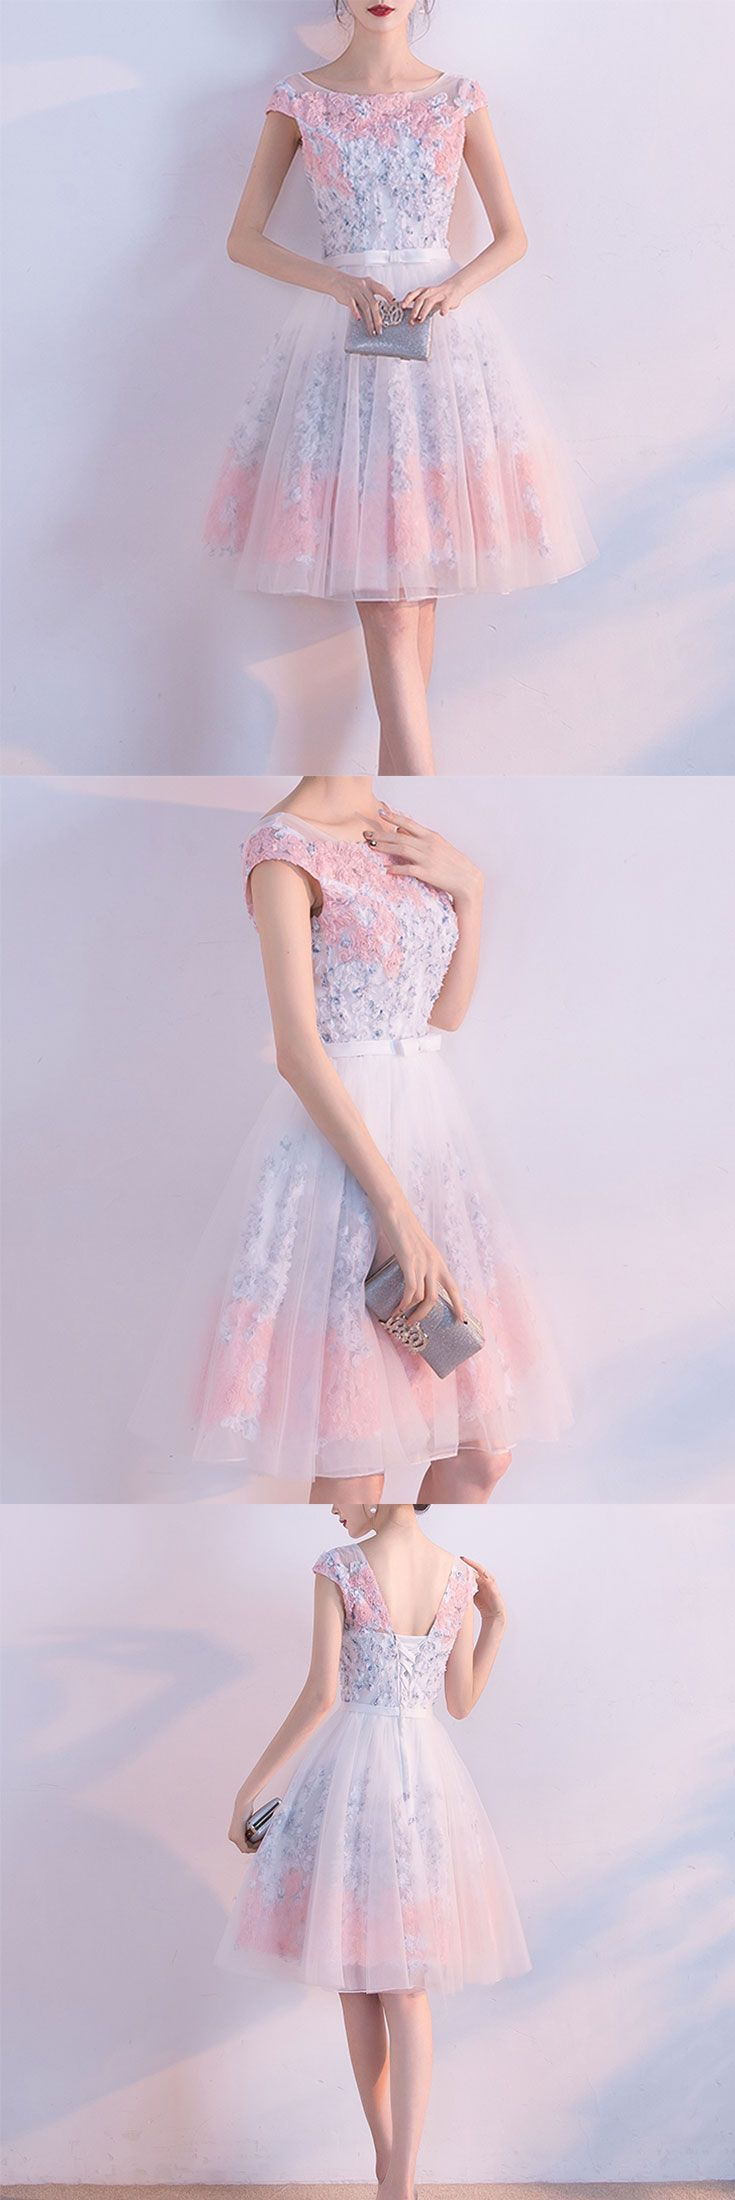 Little cute cute a line short prom dress homecoming dresses